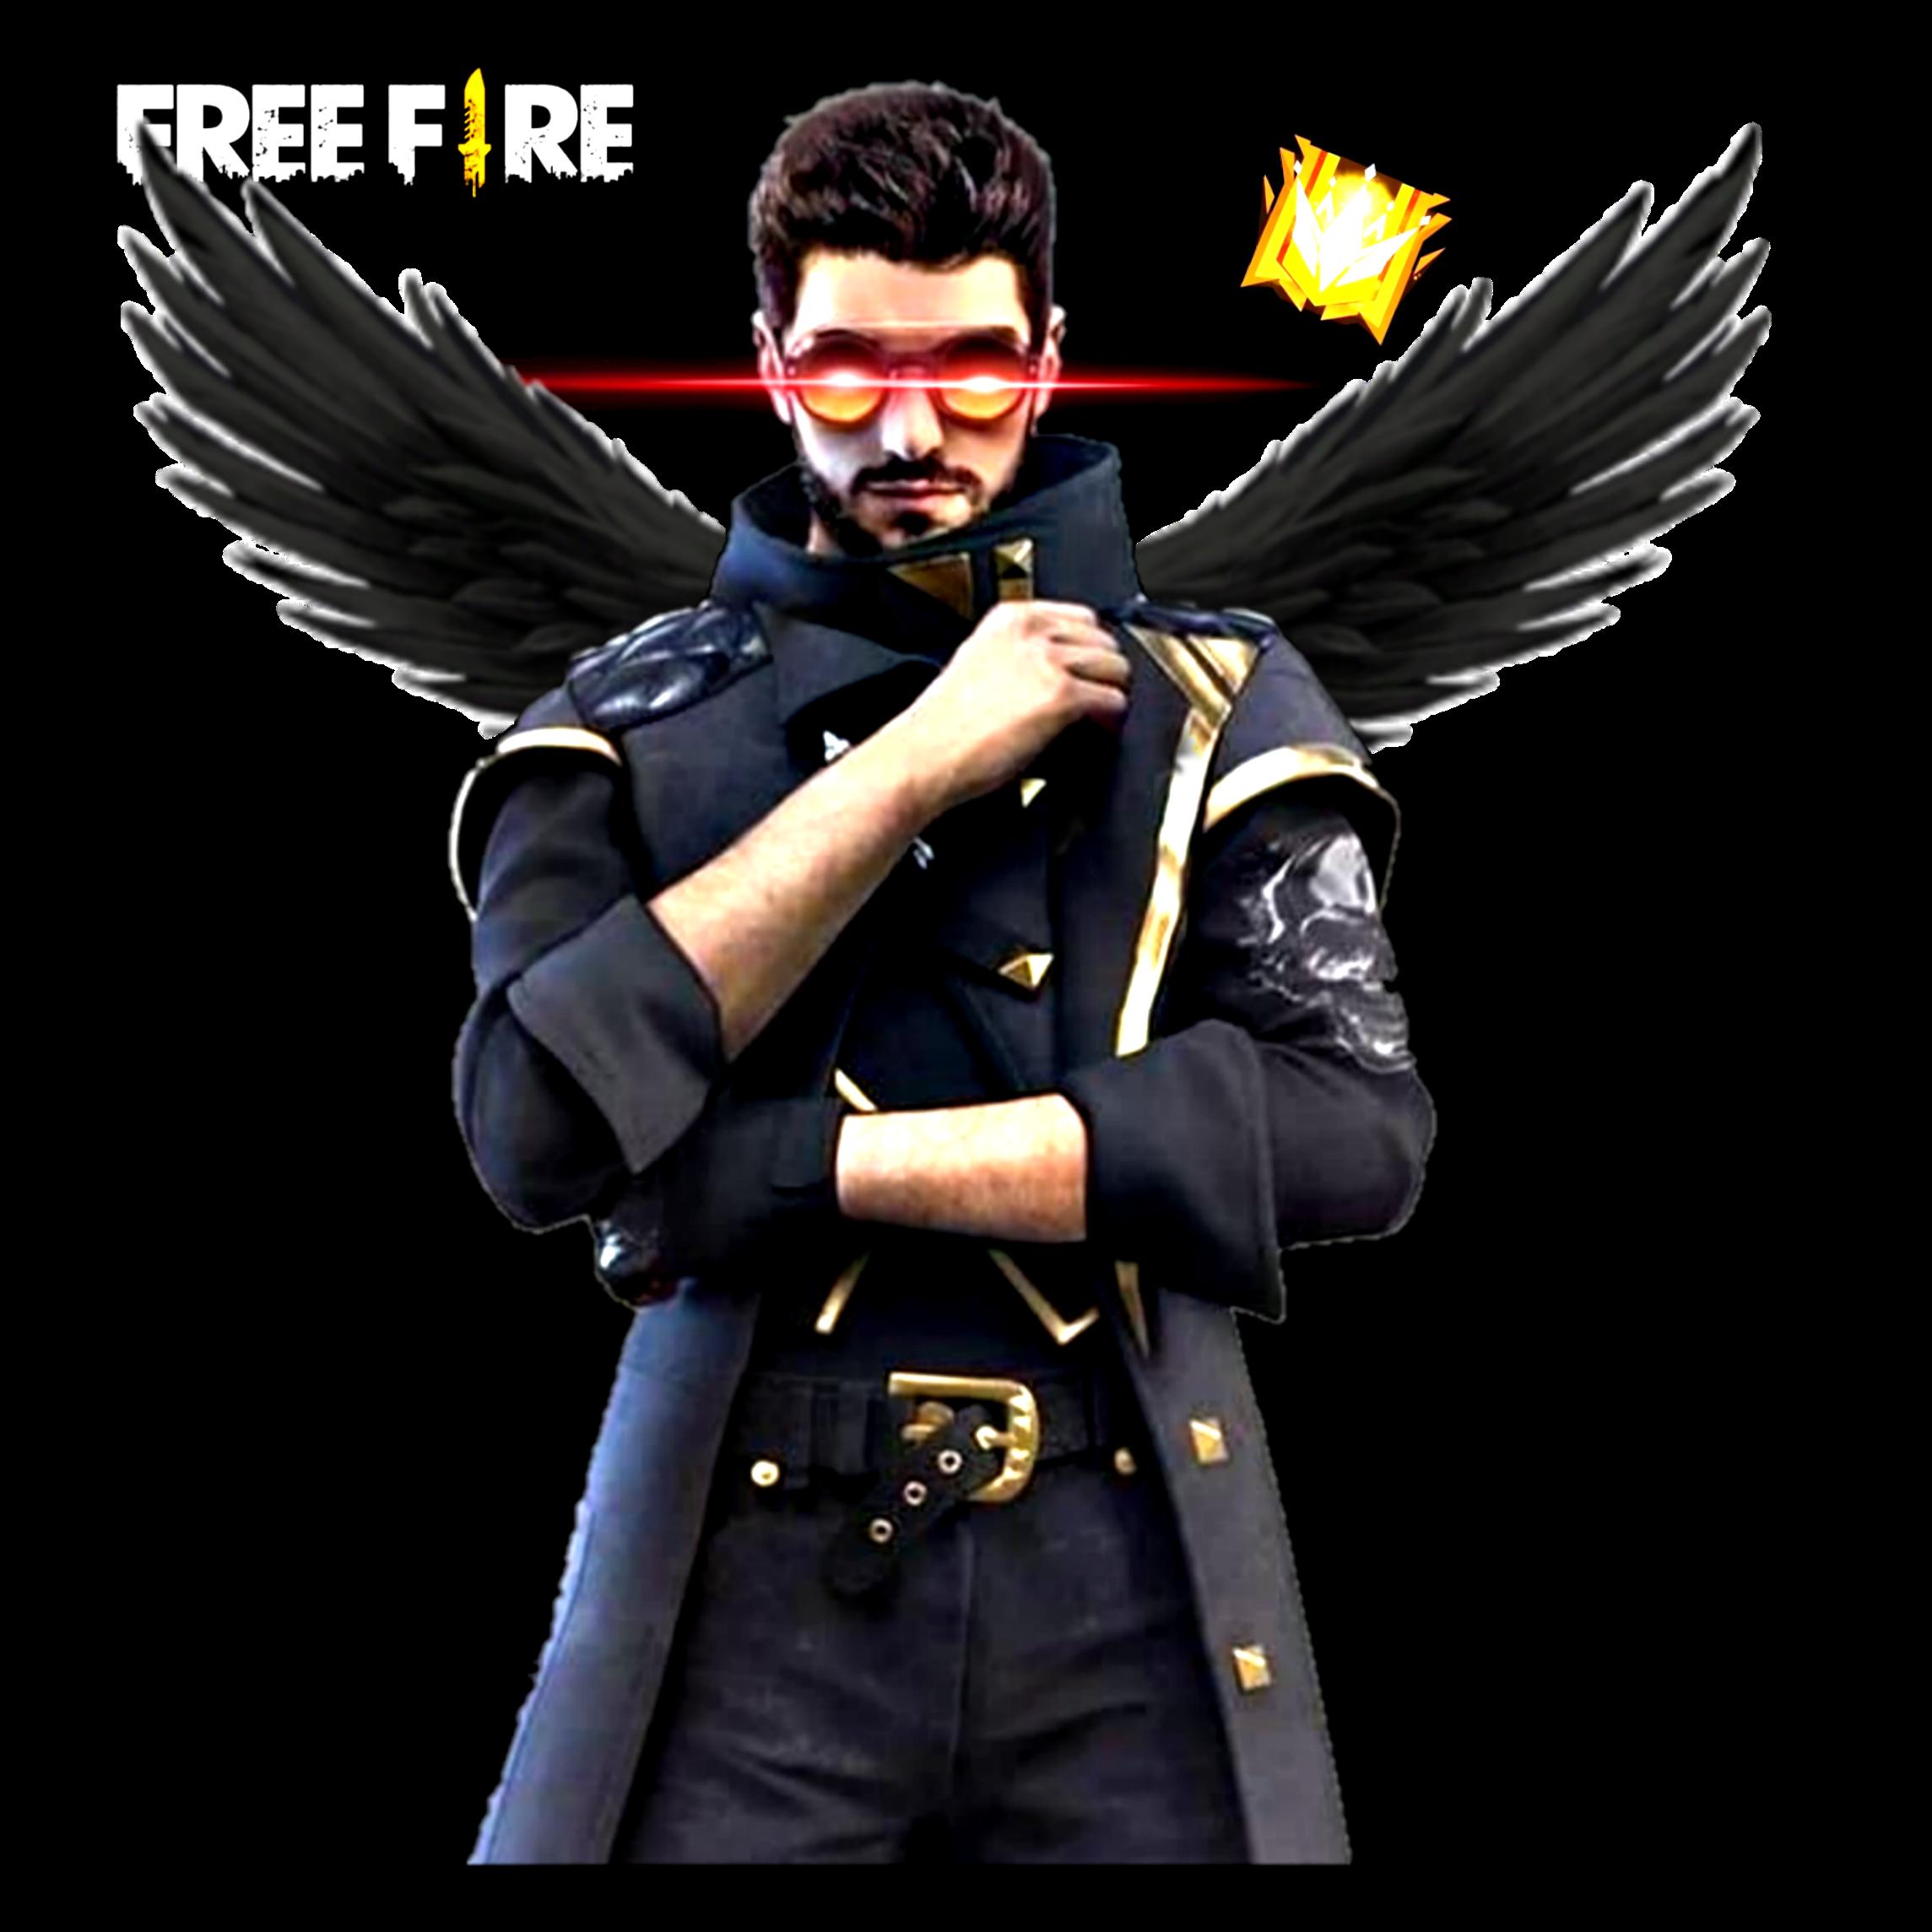 freetoeditALOKfreefire remixit in 2020 Download cute